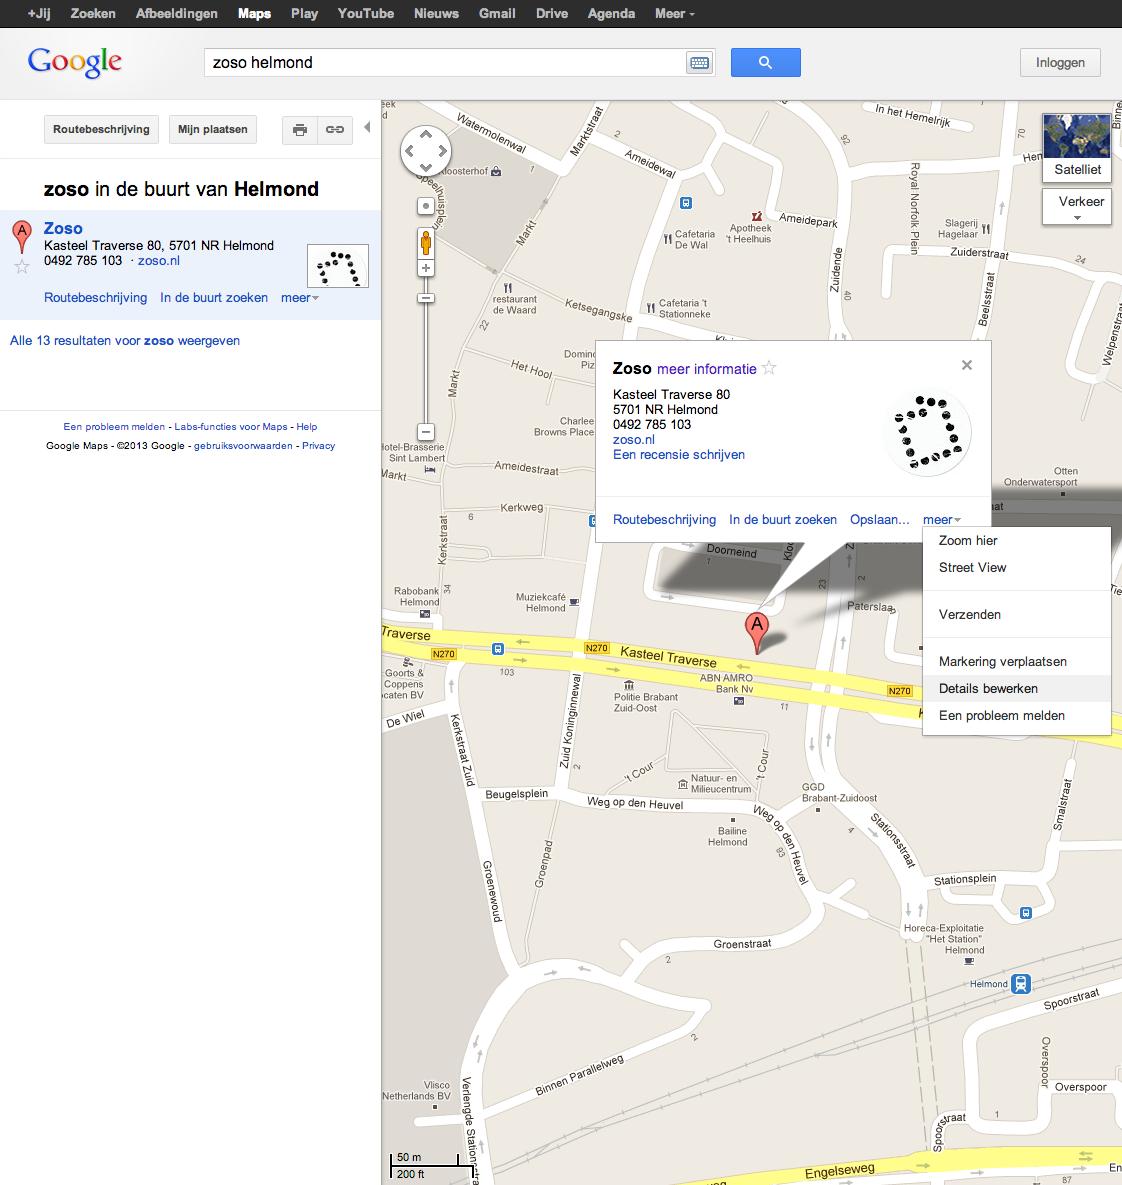 googlemapsaanpassen1.png